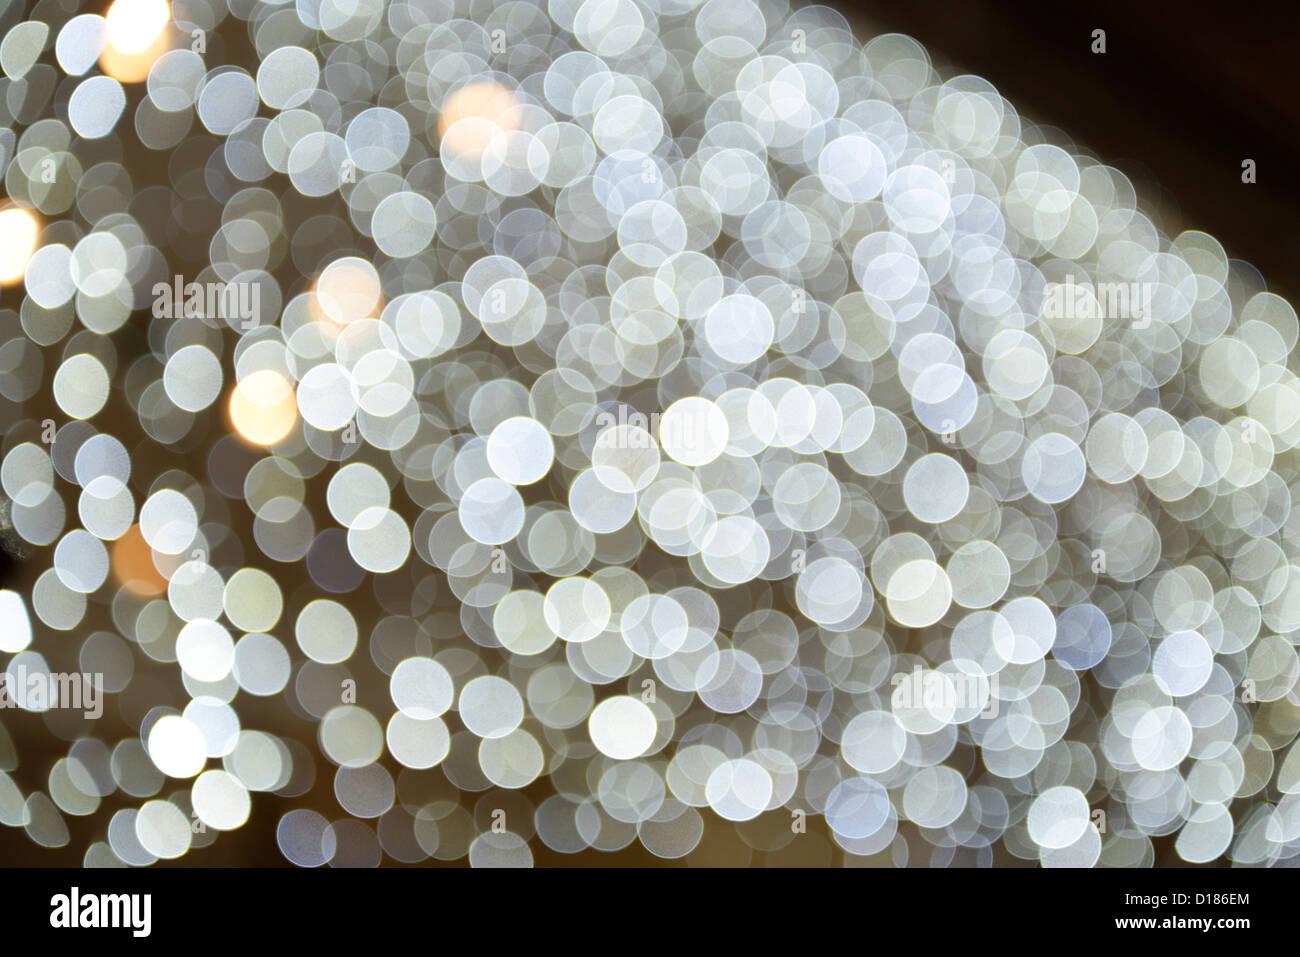 Abstract di luci bianche Immagini Stock